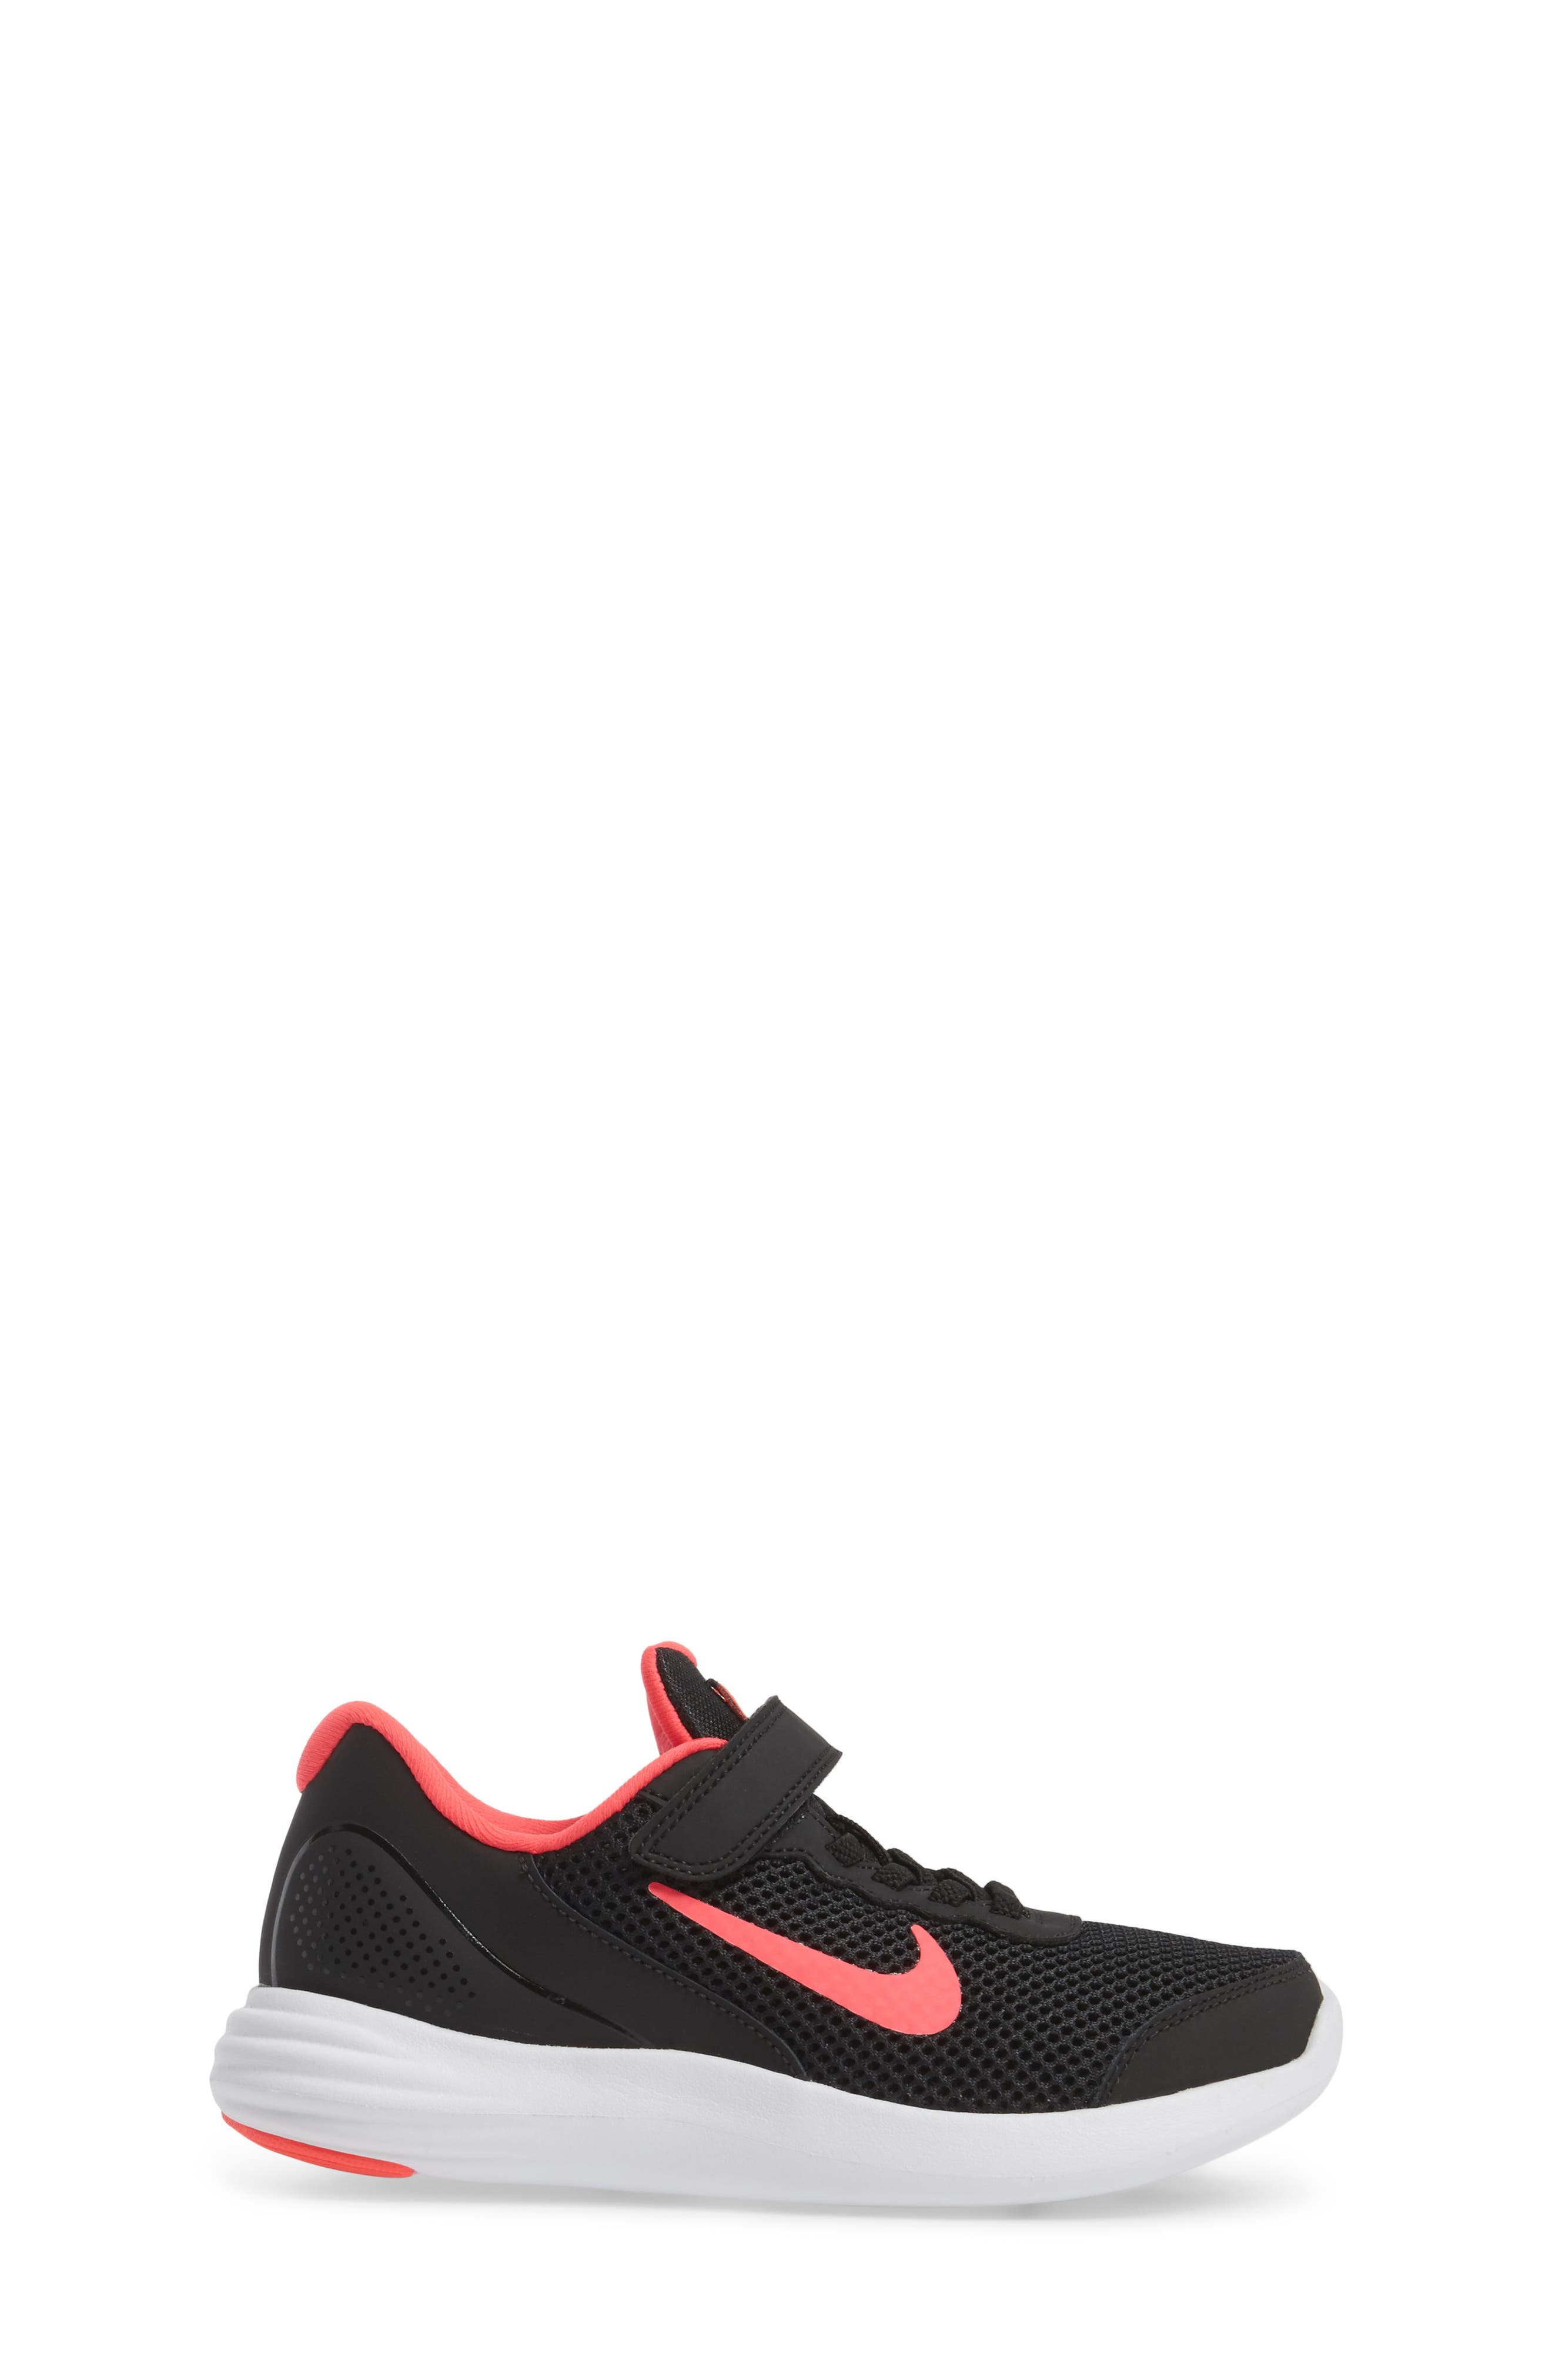 Lunar Apparent Sneaker,                             Alternate thumbnail 3, color,                             652